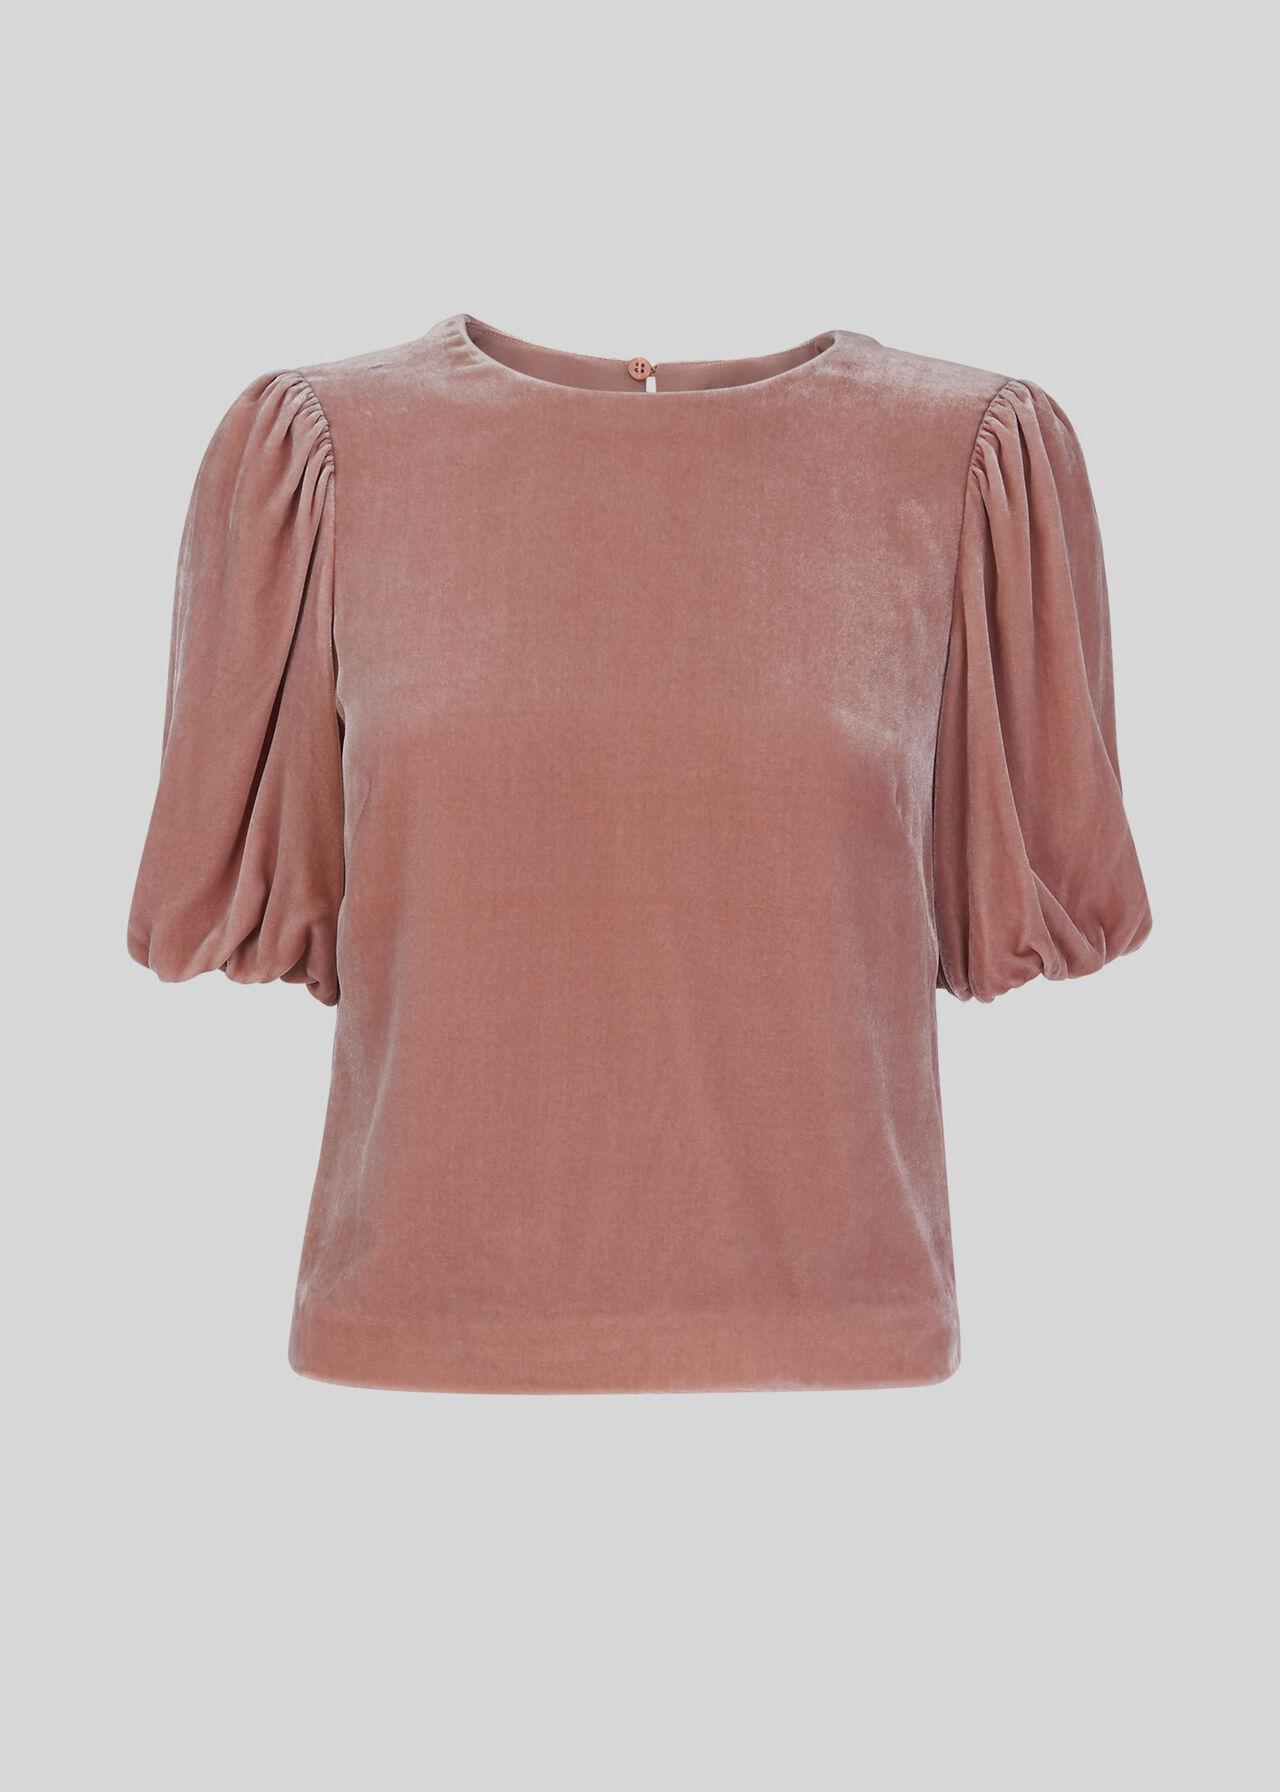 Velvet Silk Mix Top Pale Pink